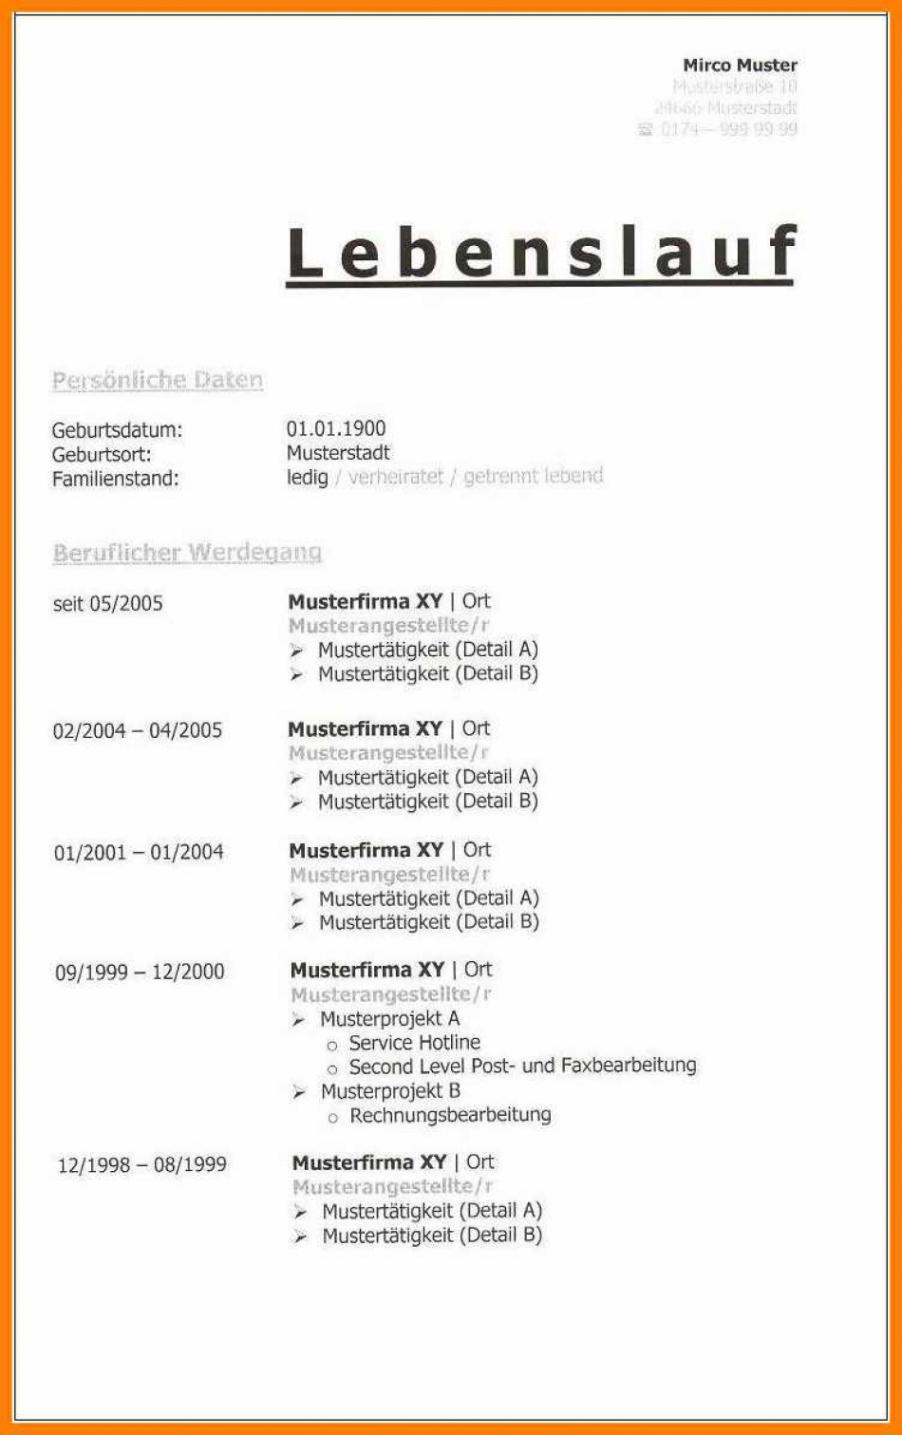 Original Lebenslauf Muster Bundeswehr 14+ Bundeswehr Lebenslauf Muster Lebenslauf Tabellarisch Bundeswehr